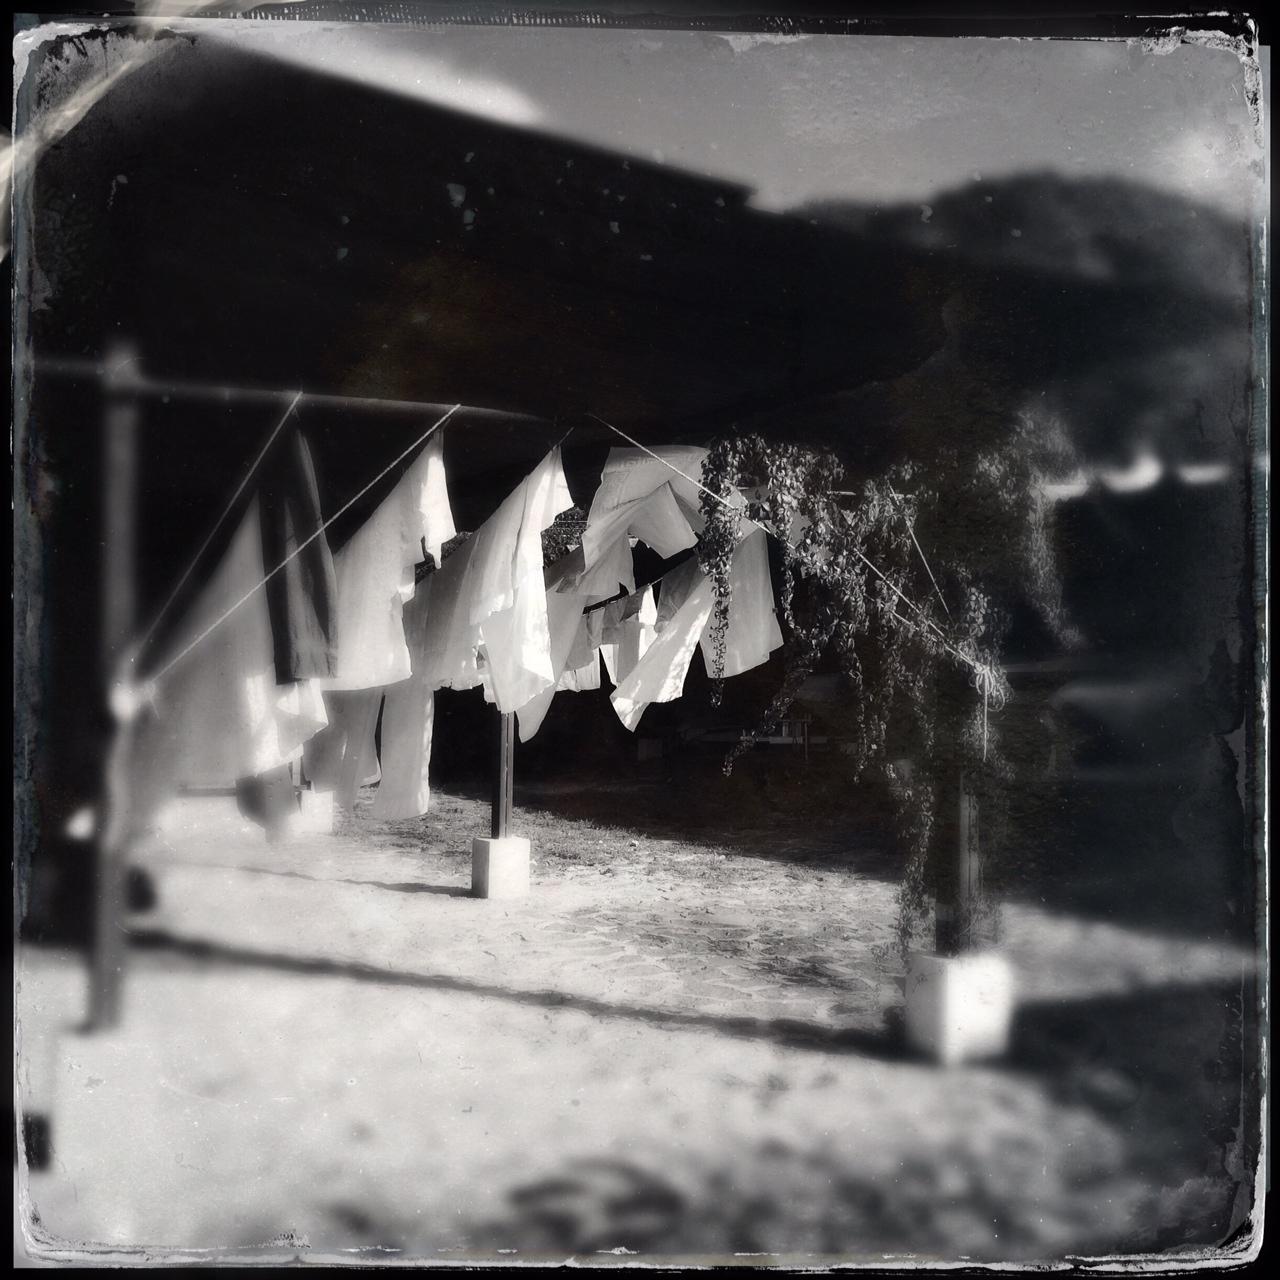 Bride White and Washed | San Lucas Toliman, Guatemala | November 2014